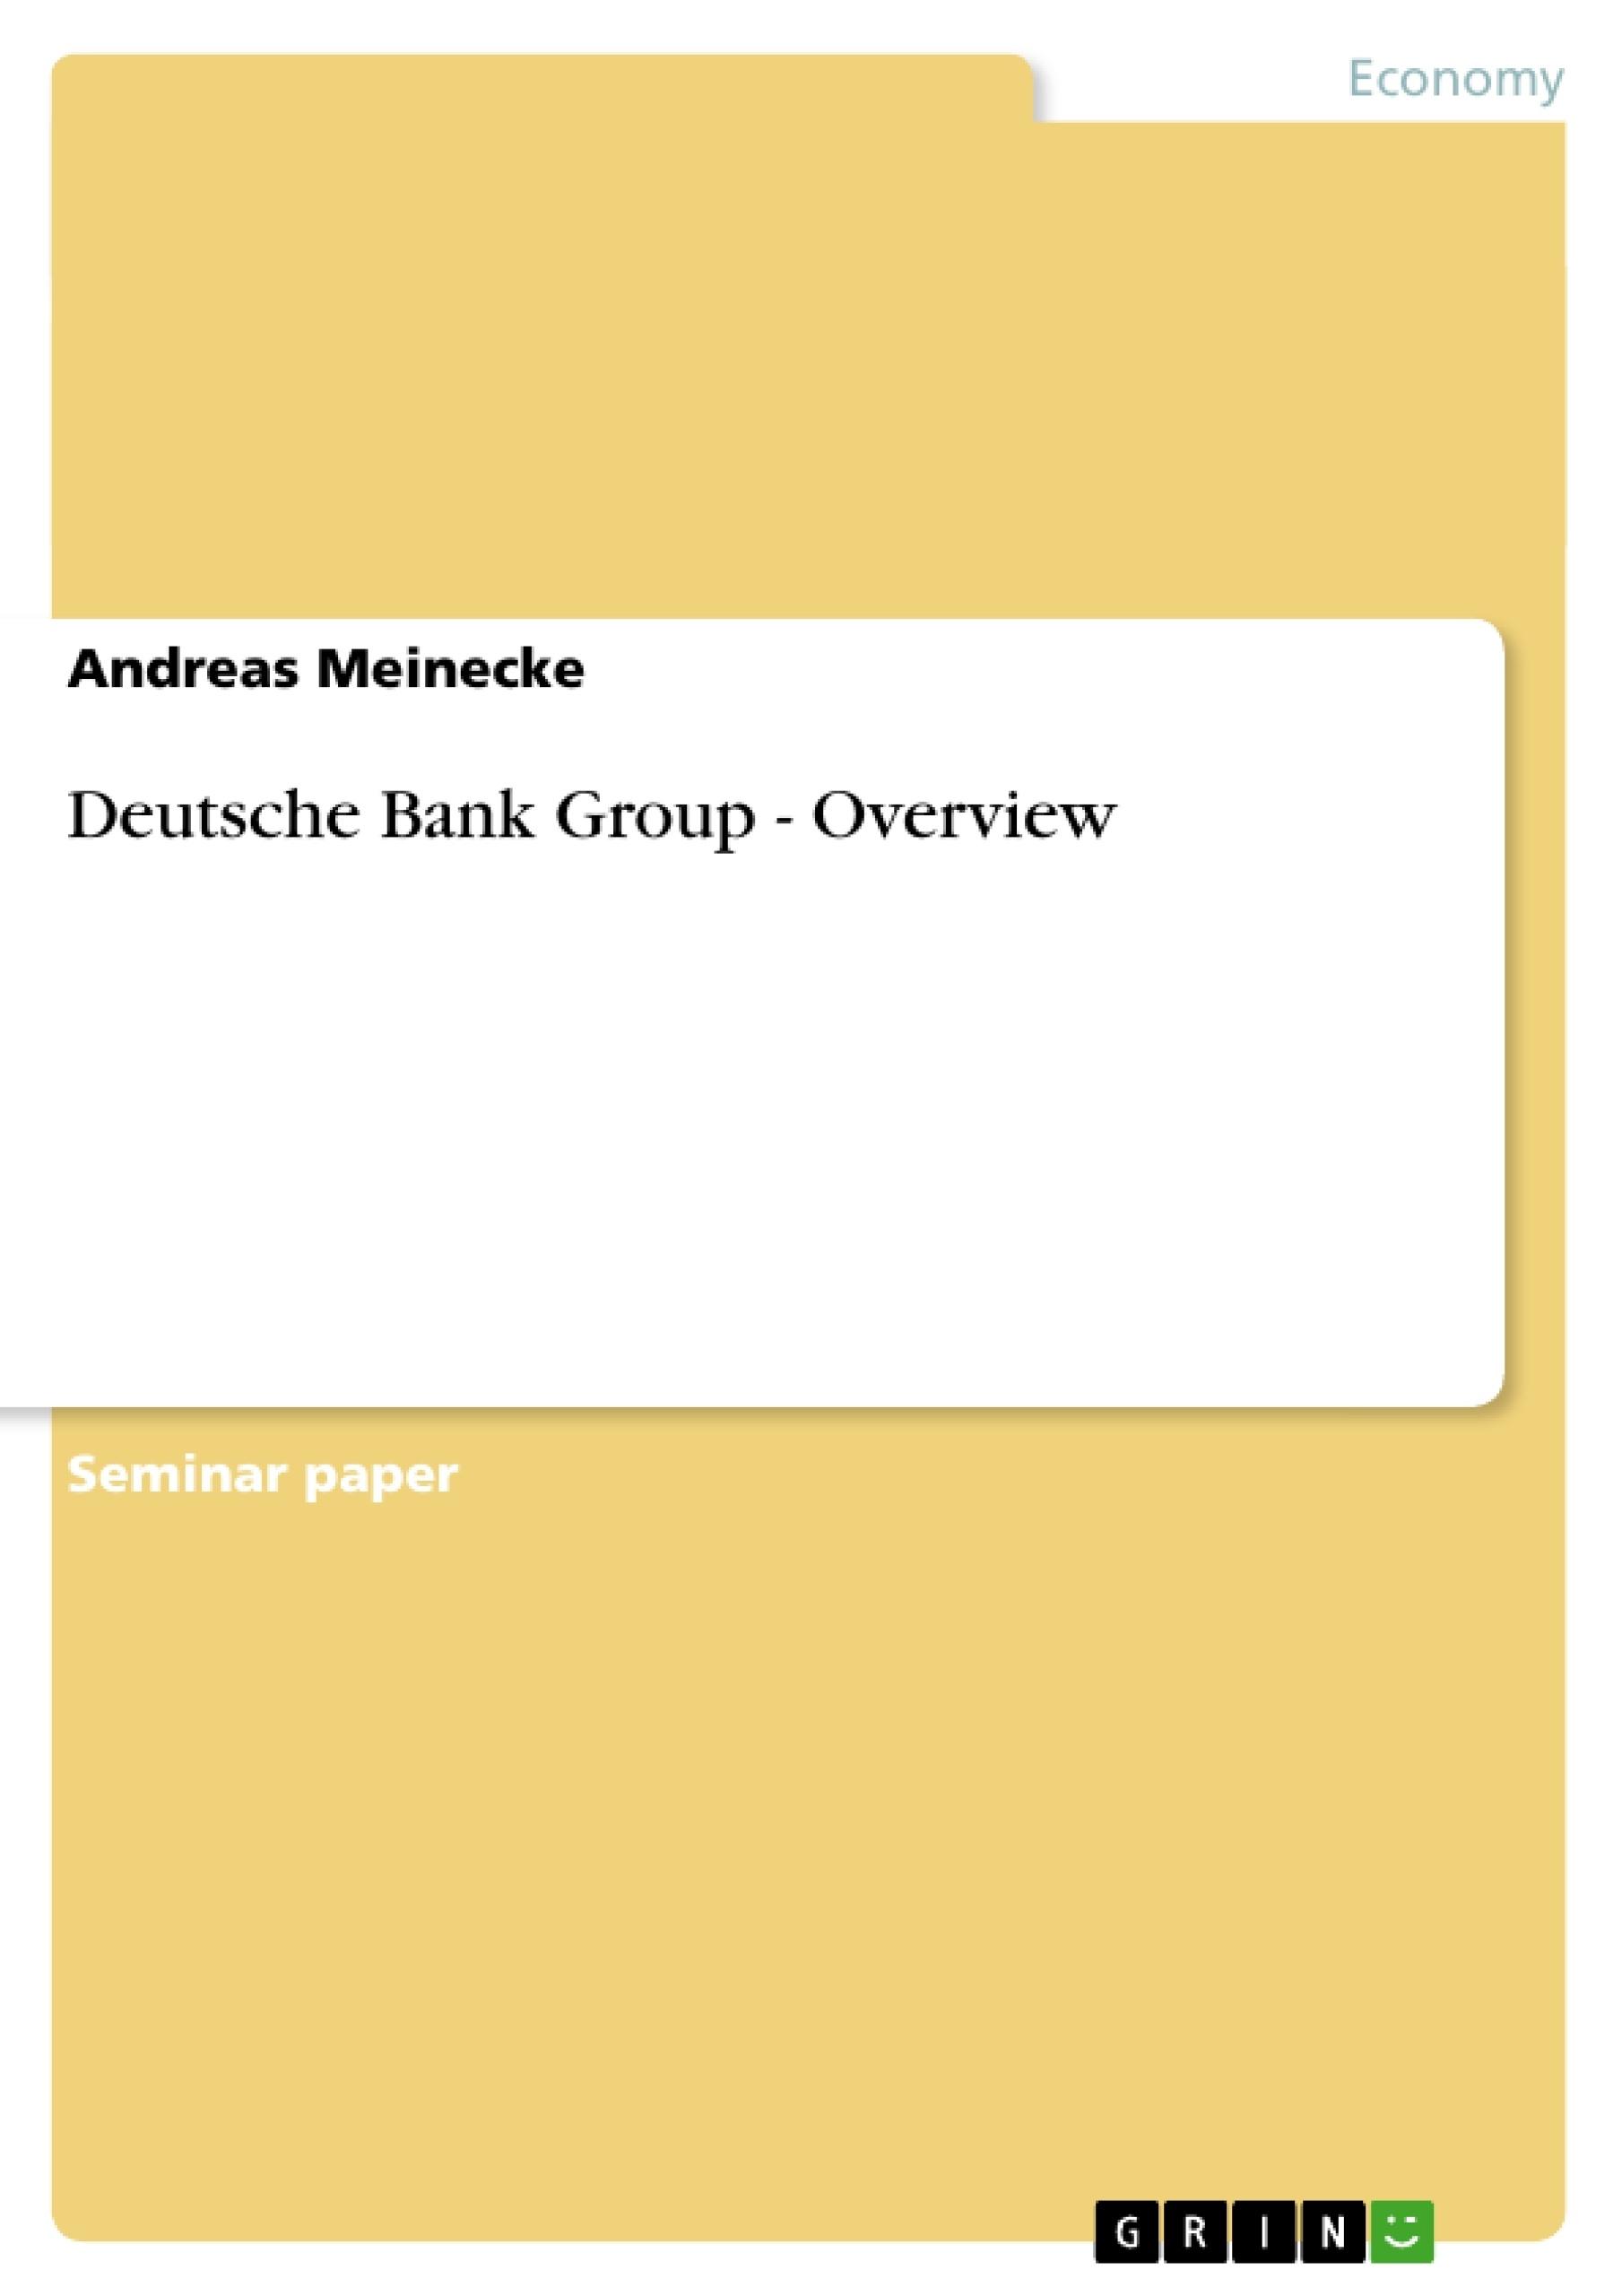 Title: Deutsche Bank Group - Overview